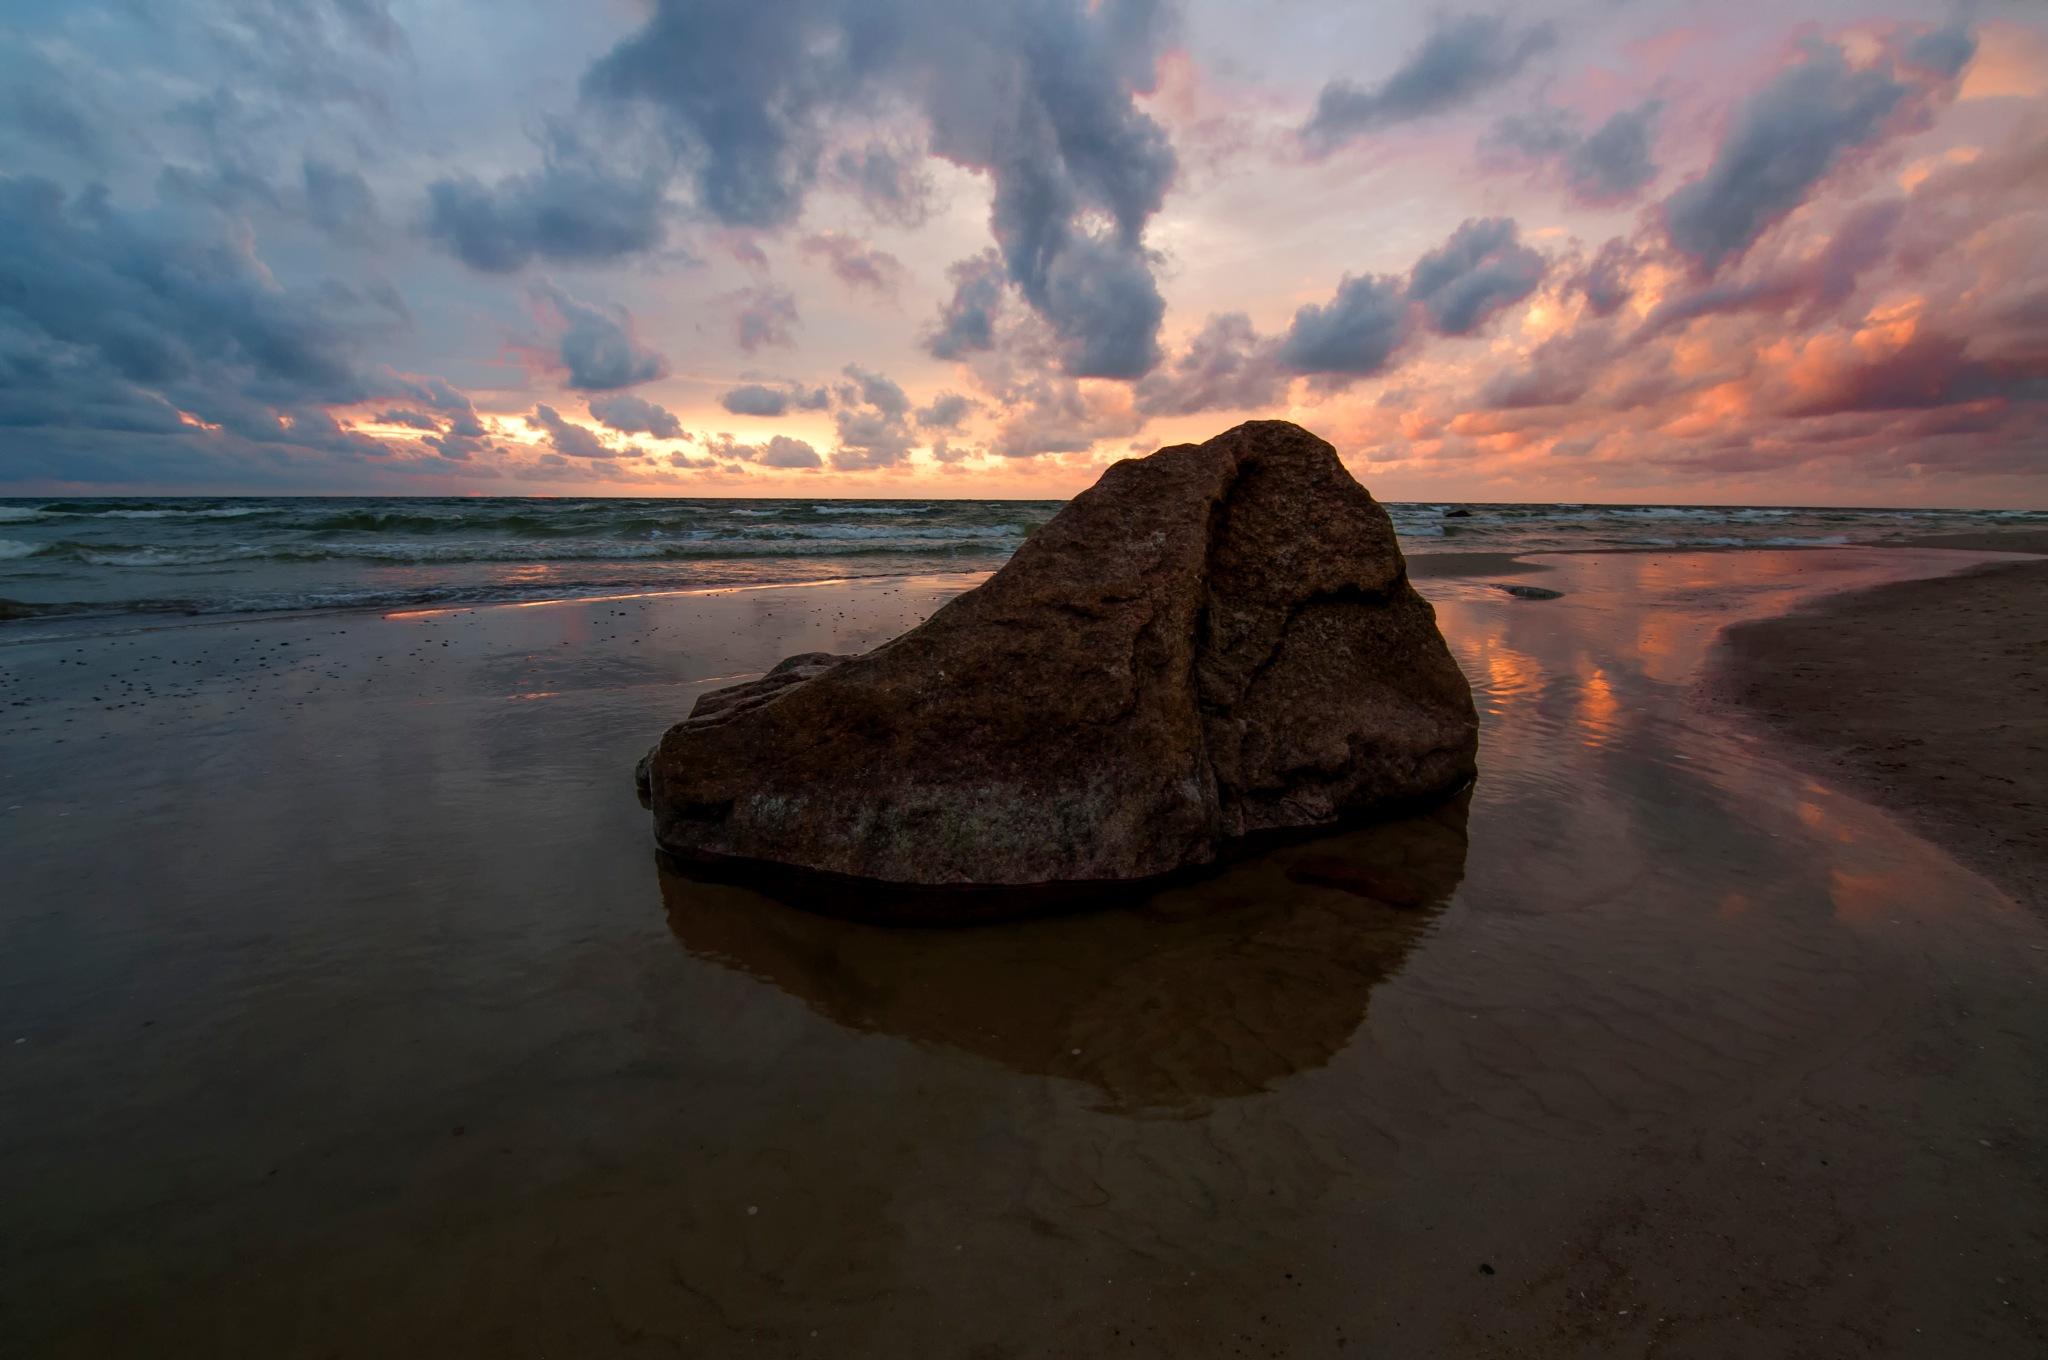 Sunset by Daiva Cirtautė